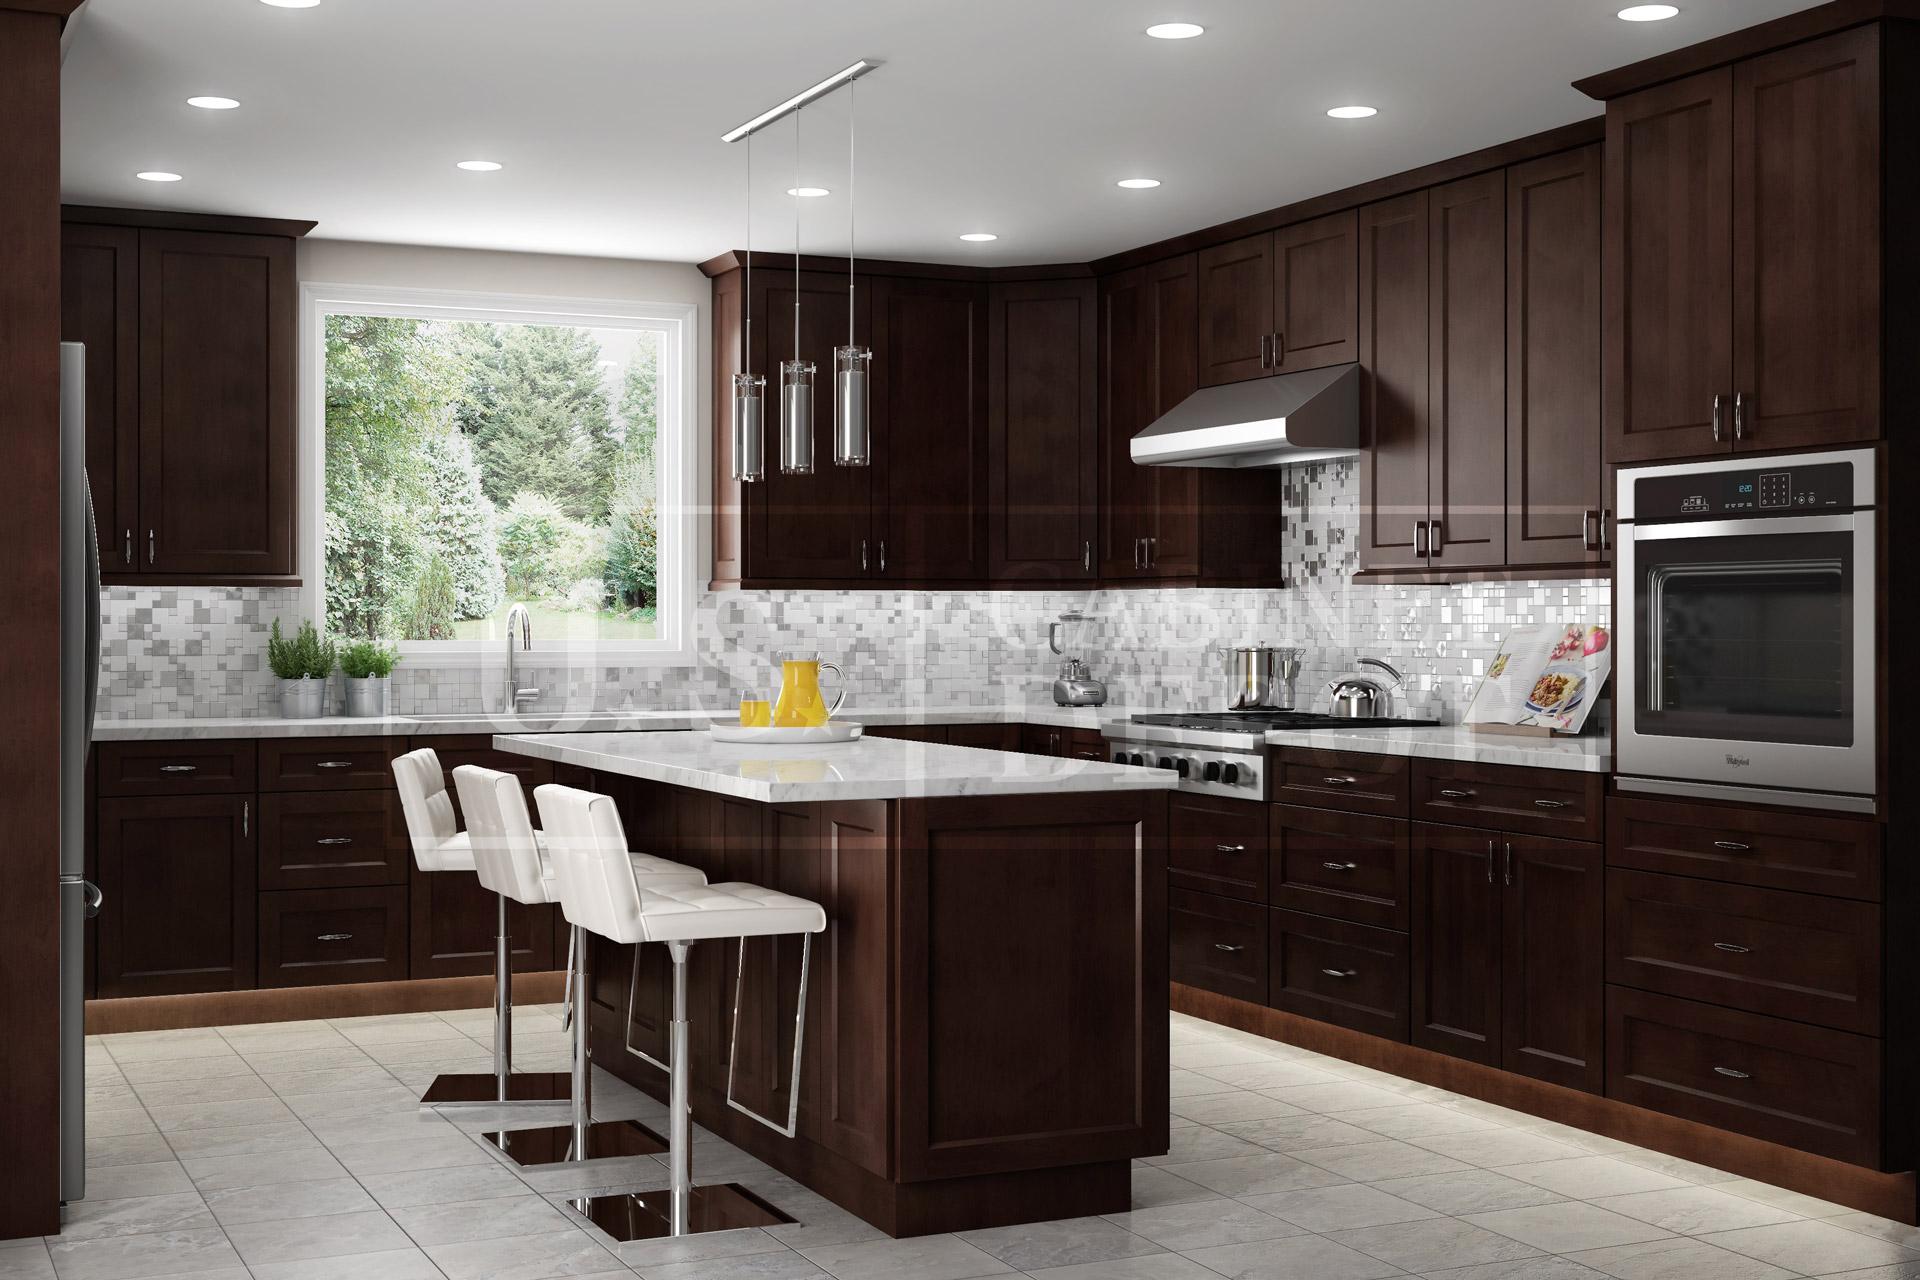 Small Kitchen Design Narrow